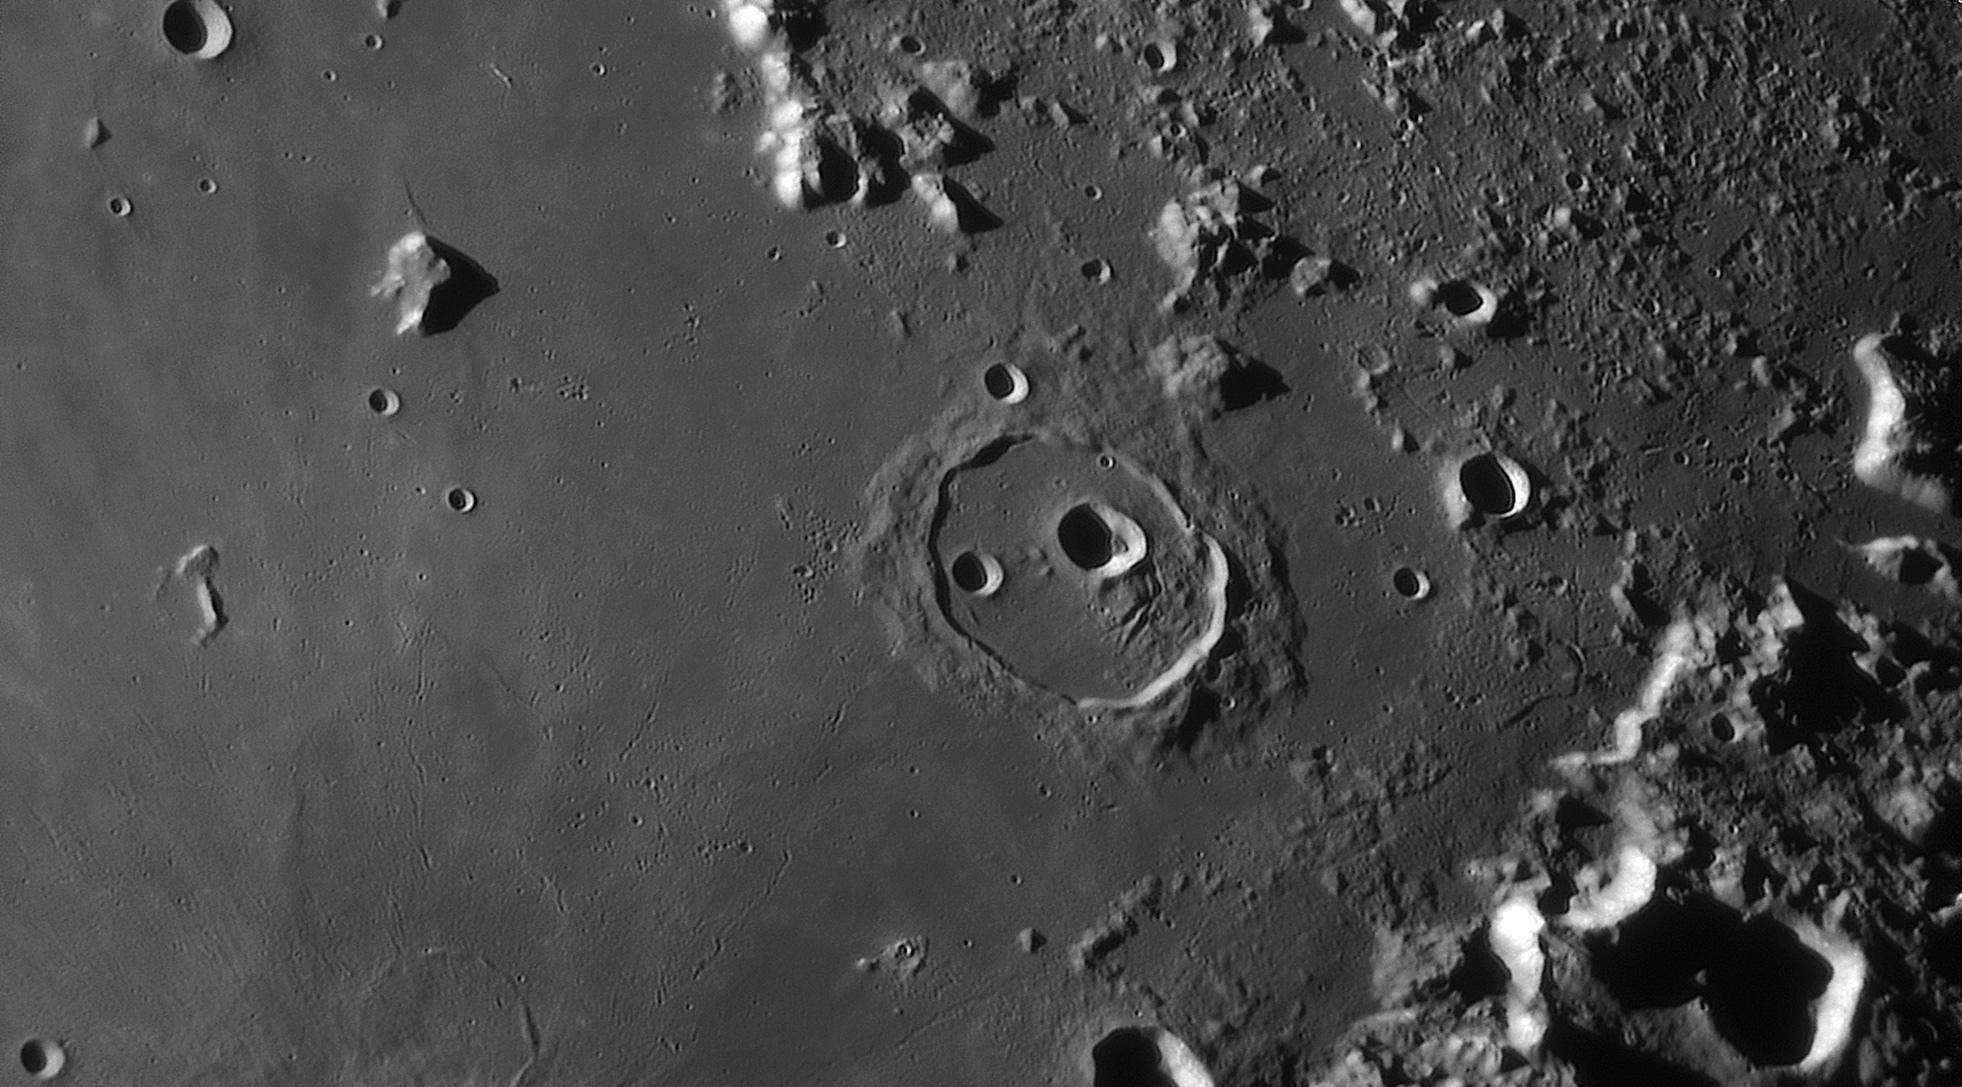 large.moon_23_07_2019_04_02_05_CASSINI.jpg.951dcef0acf7e23014f1615e71a0e708.jpg